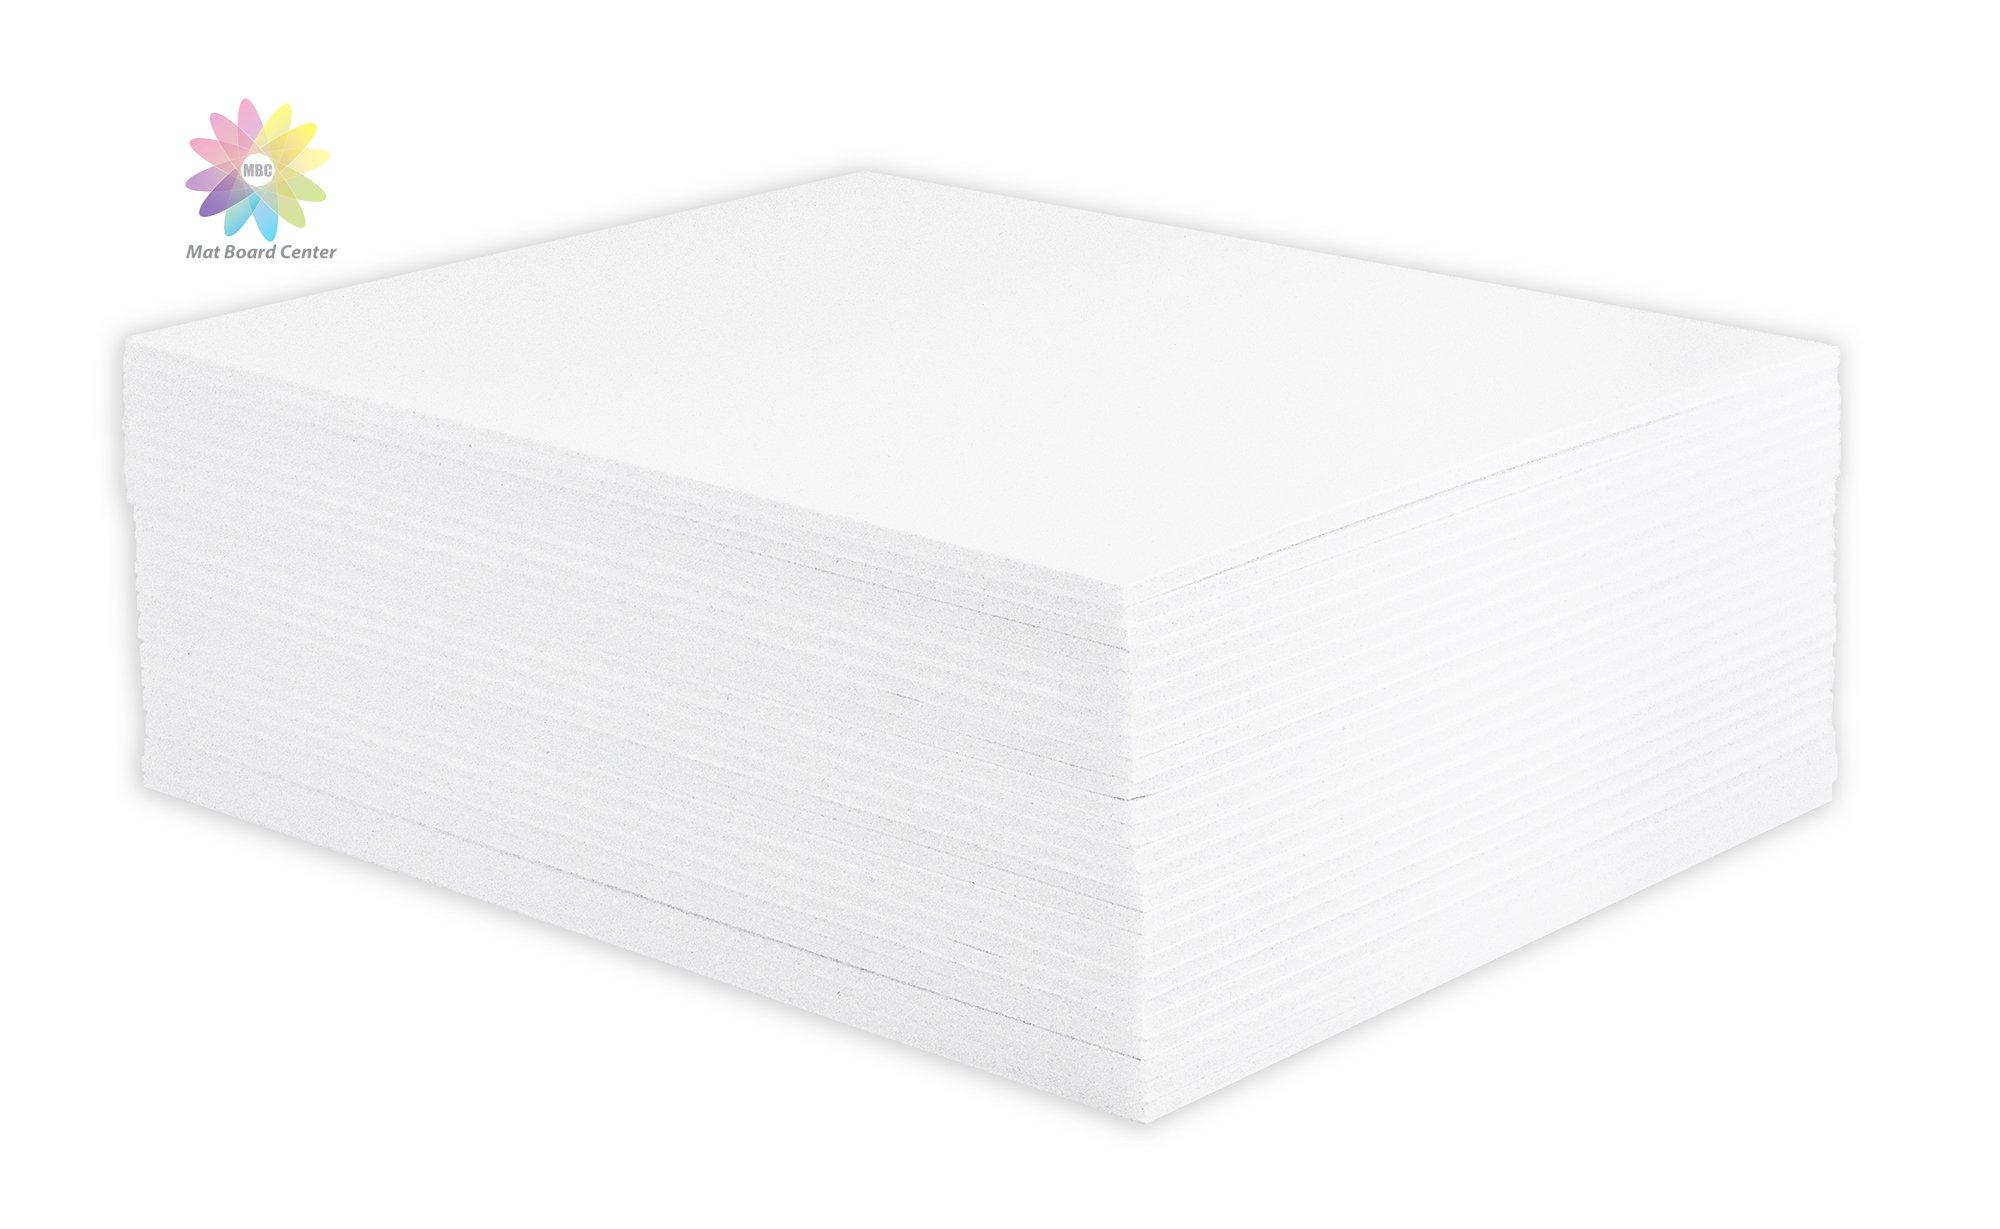 Mat Board Center, Pack of 25 11x14 1/8'' White Foam Core Backing Boards by MBC MAT BOARD CENTER